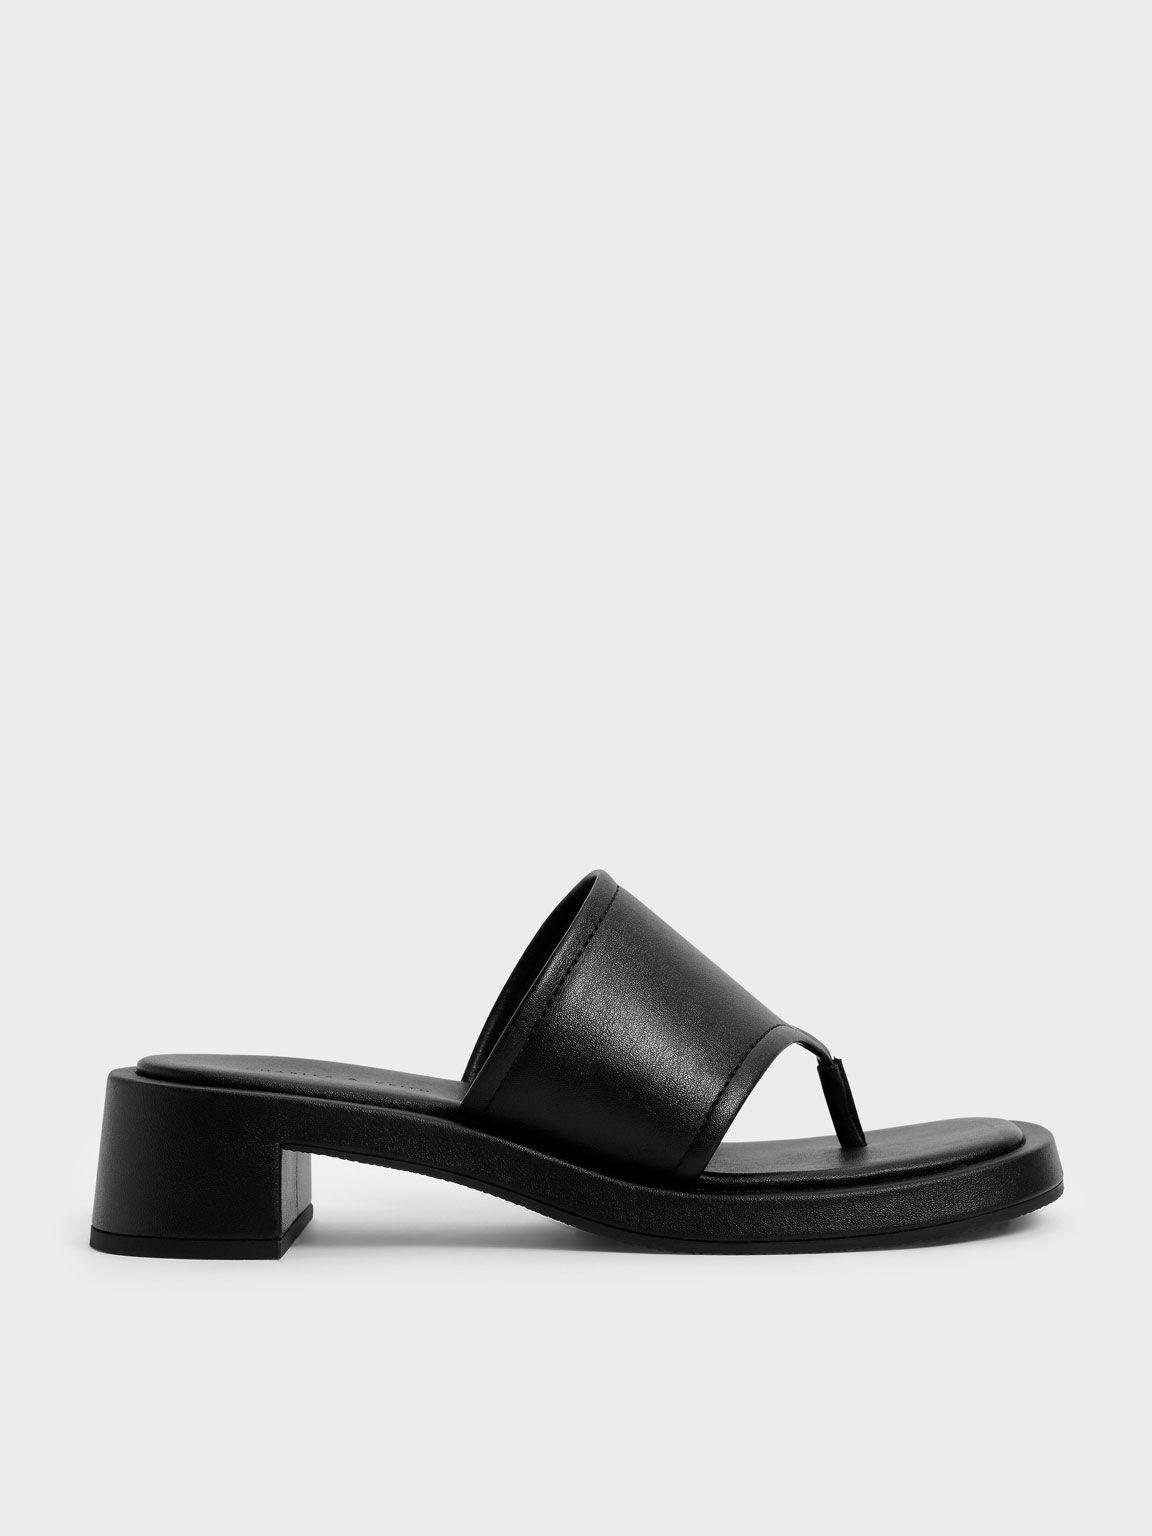 Padded Thong Sandals, Black, hi-res